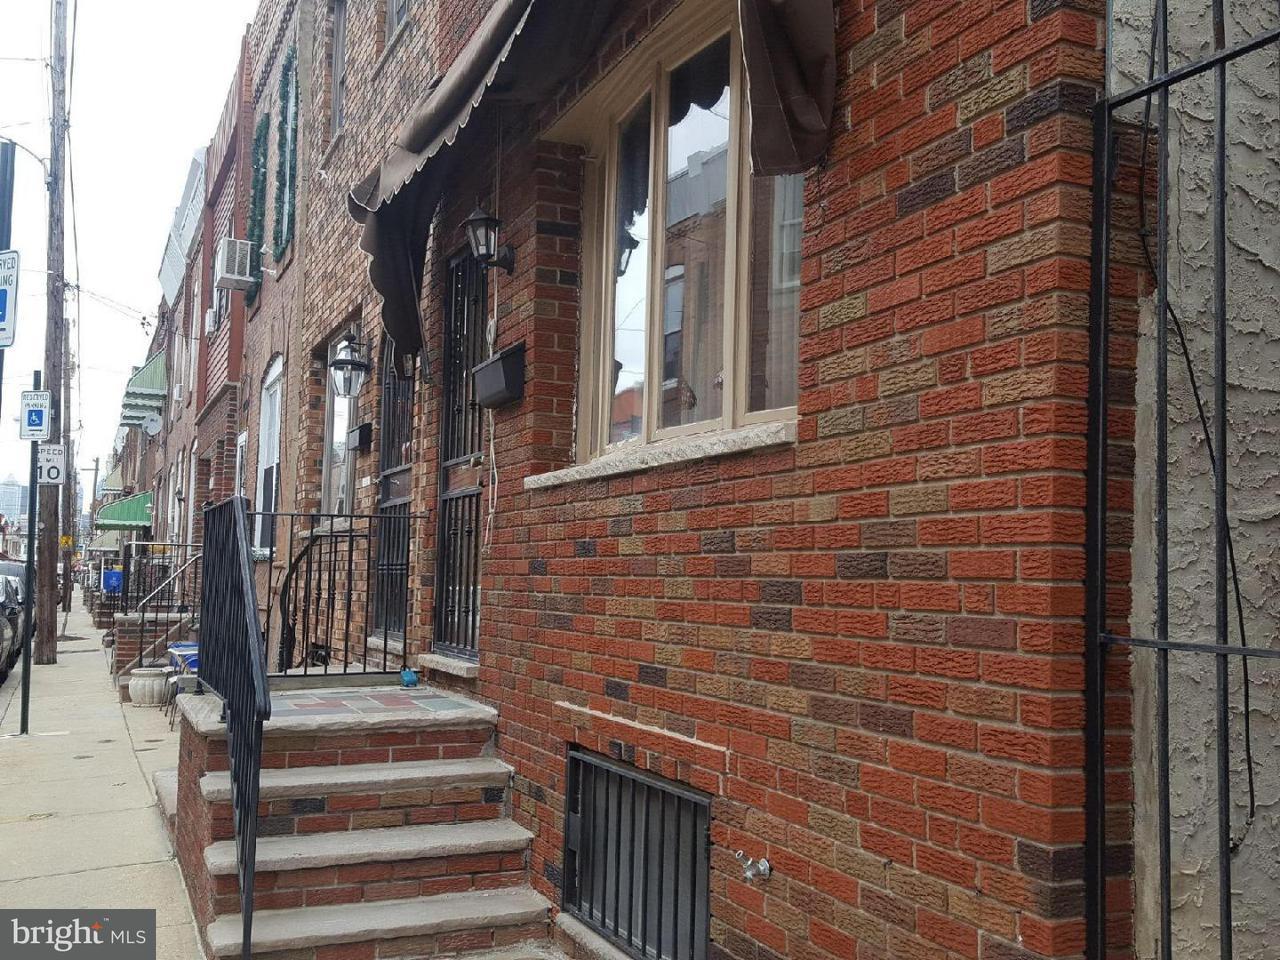 2243 S Chadwick Philadelphia, PA 19145